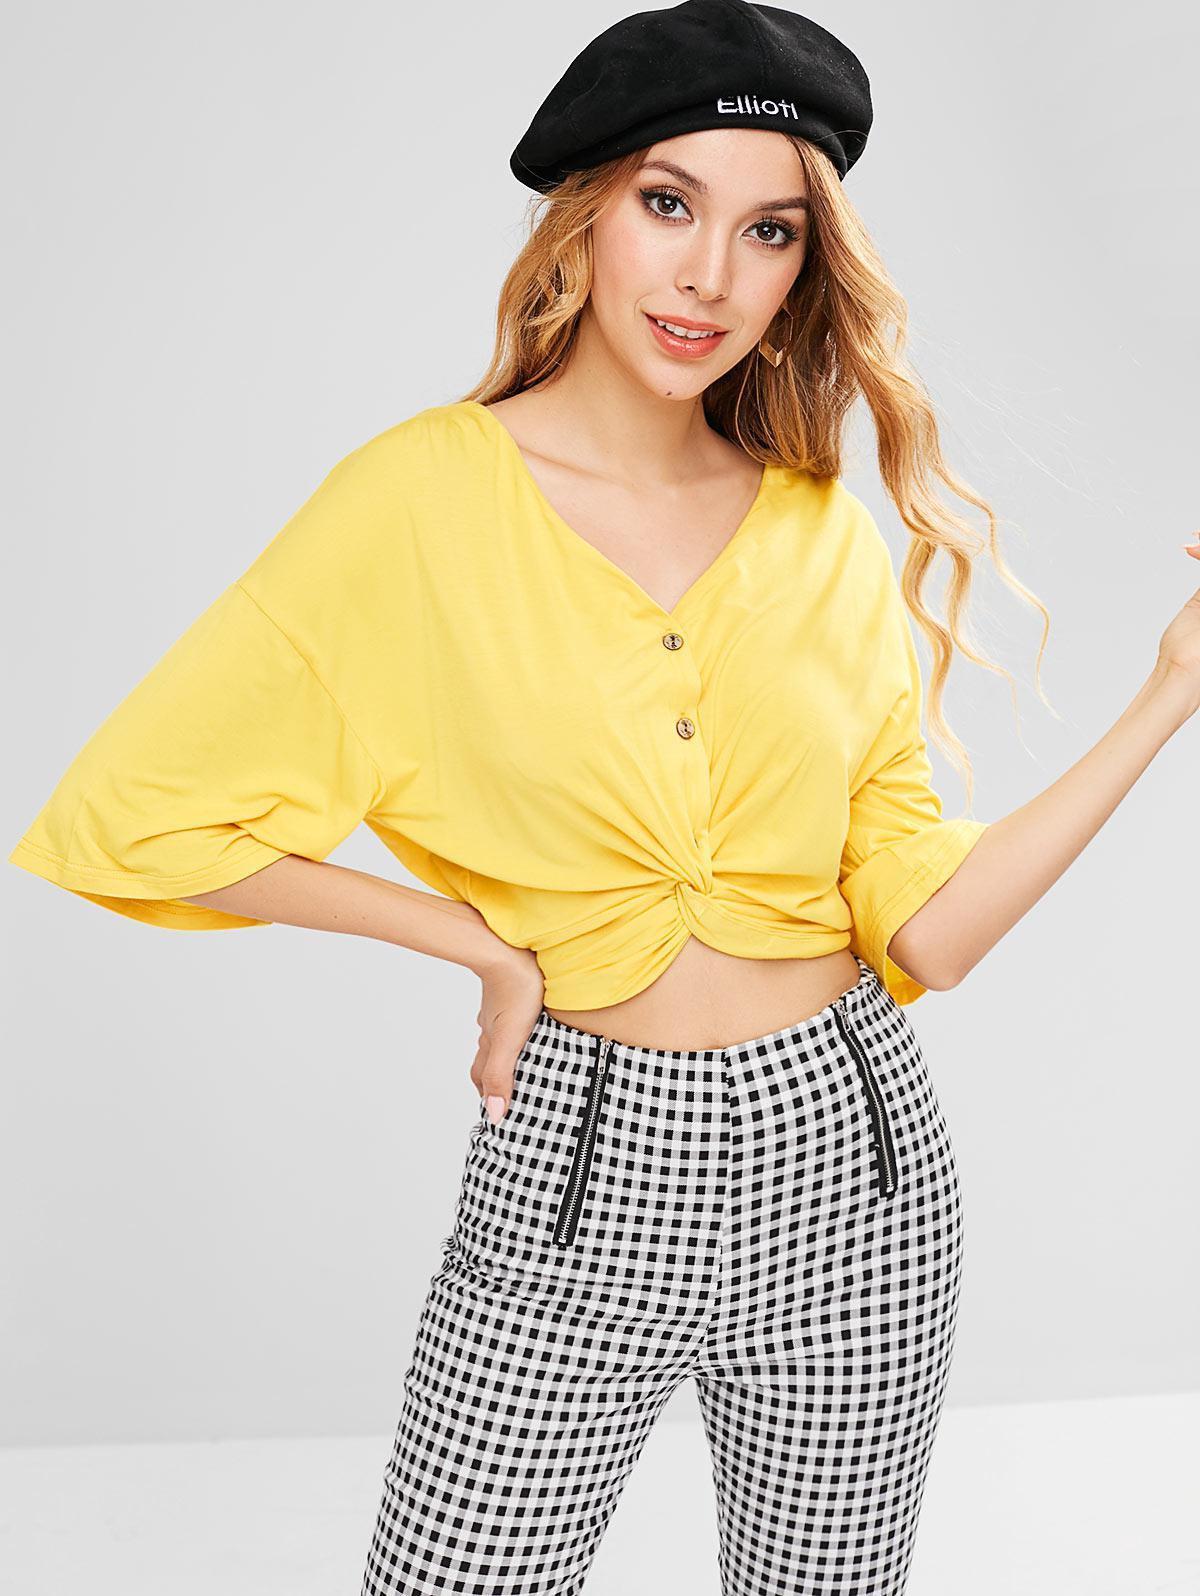 ZAFUL Button Up Twist Top, Yellow